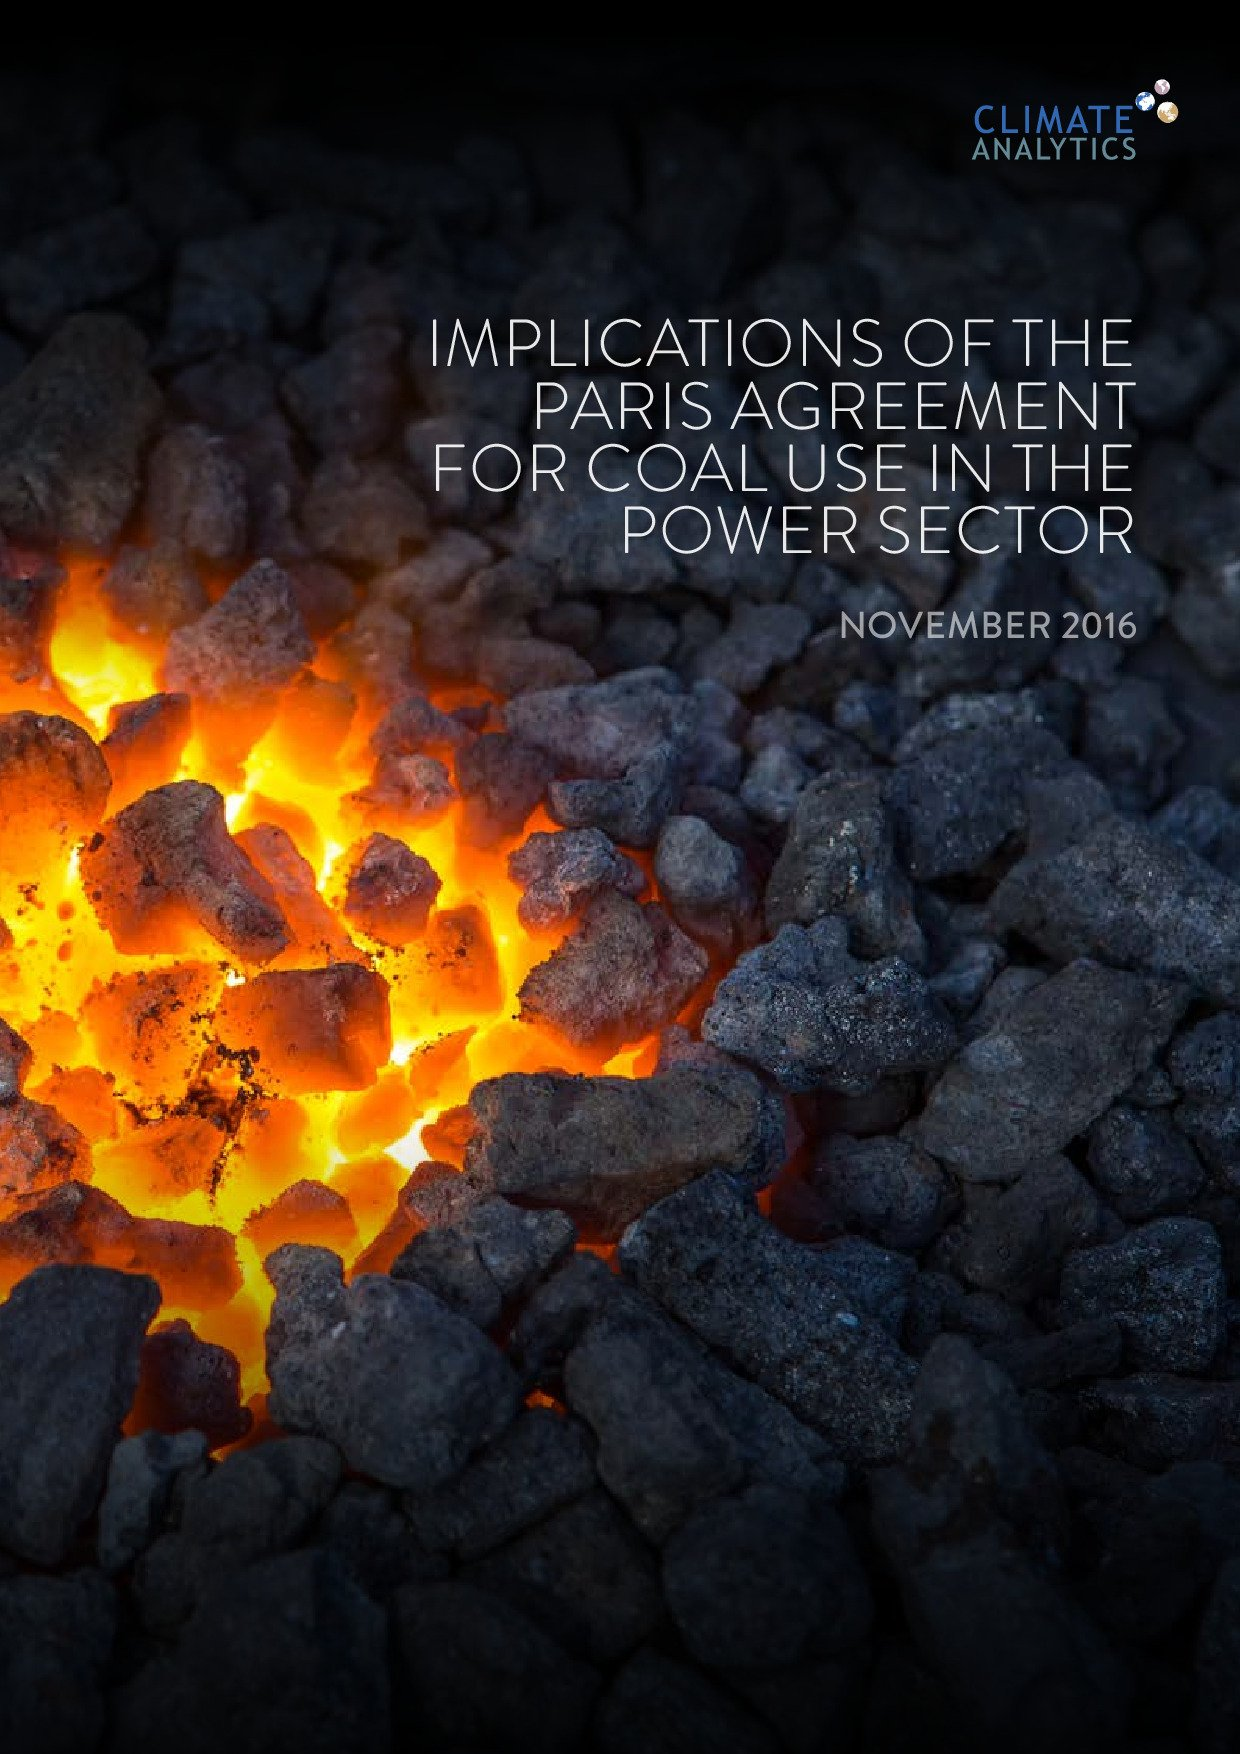 Implications of the paris agreement for coal use in the power sector implications of the paris agreement for coal use in the power sector climate analytics platinumwayz